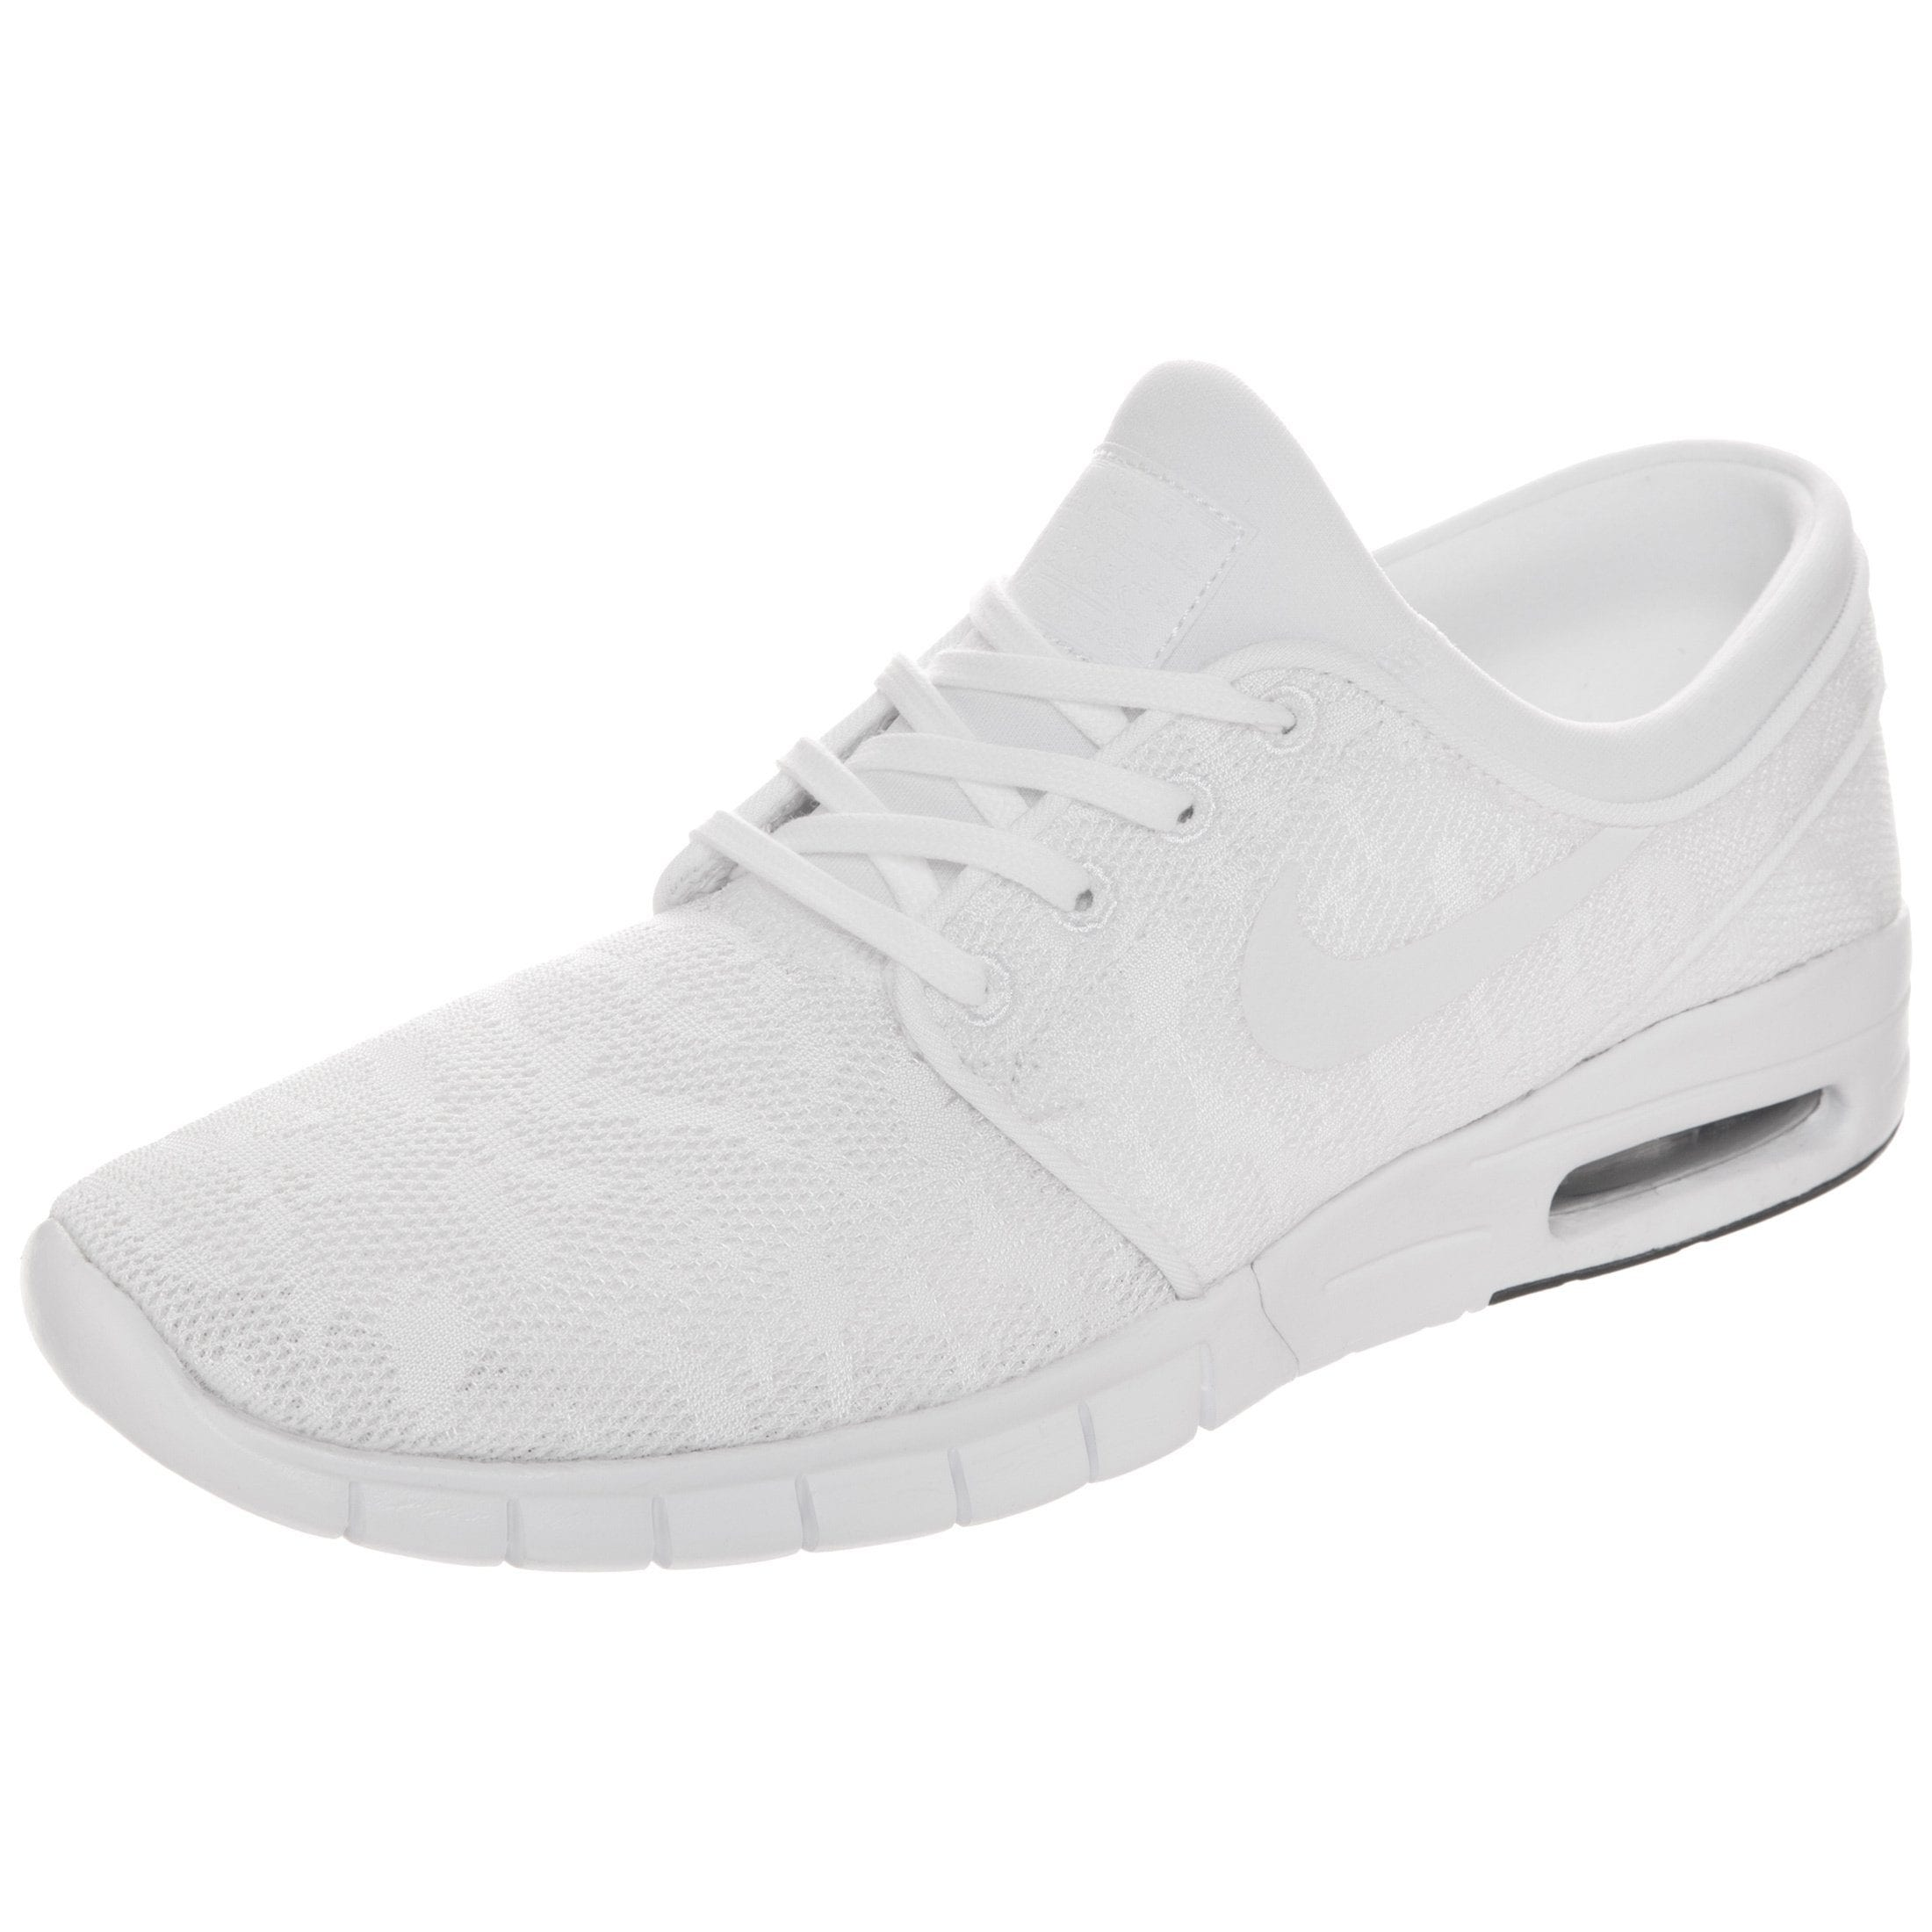 Nike SB Sneaker Sneaker Sneaker Stefan Janoski Max bestellen | Gutes Preis-Leistungs-Verhältnis, es lohnt sich b41ba5